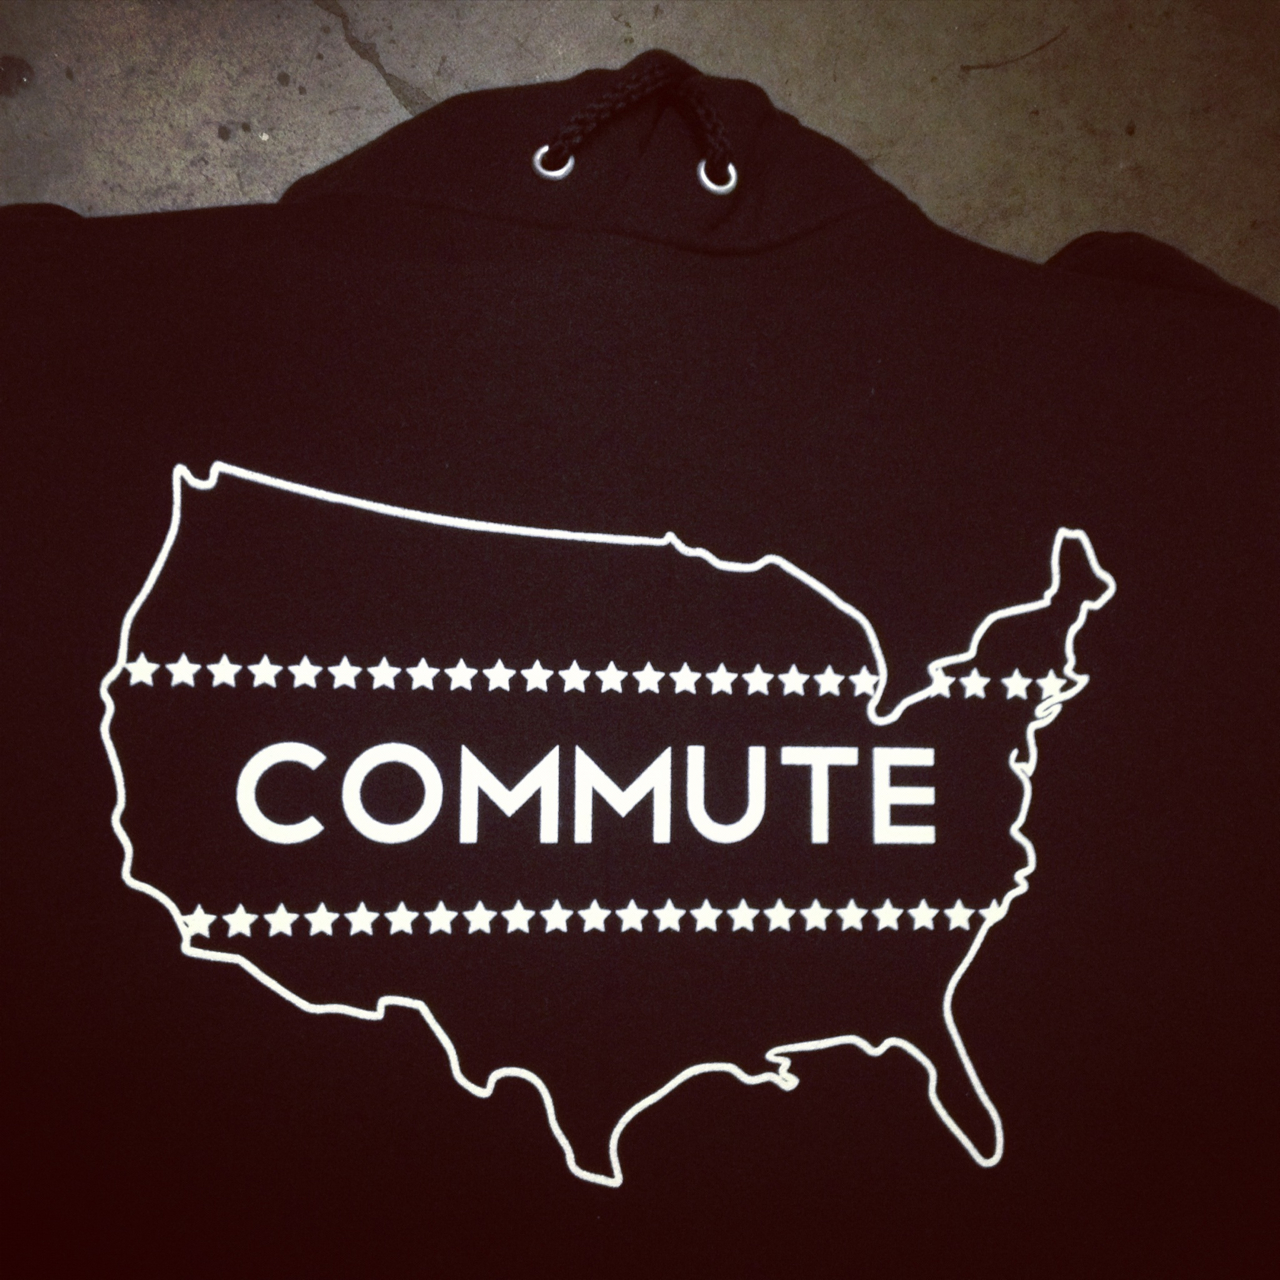 Commute sweatshirts